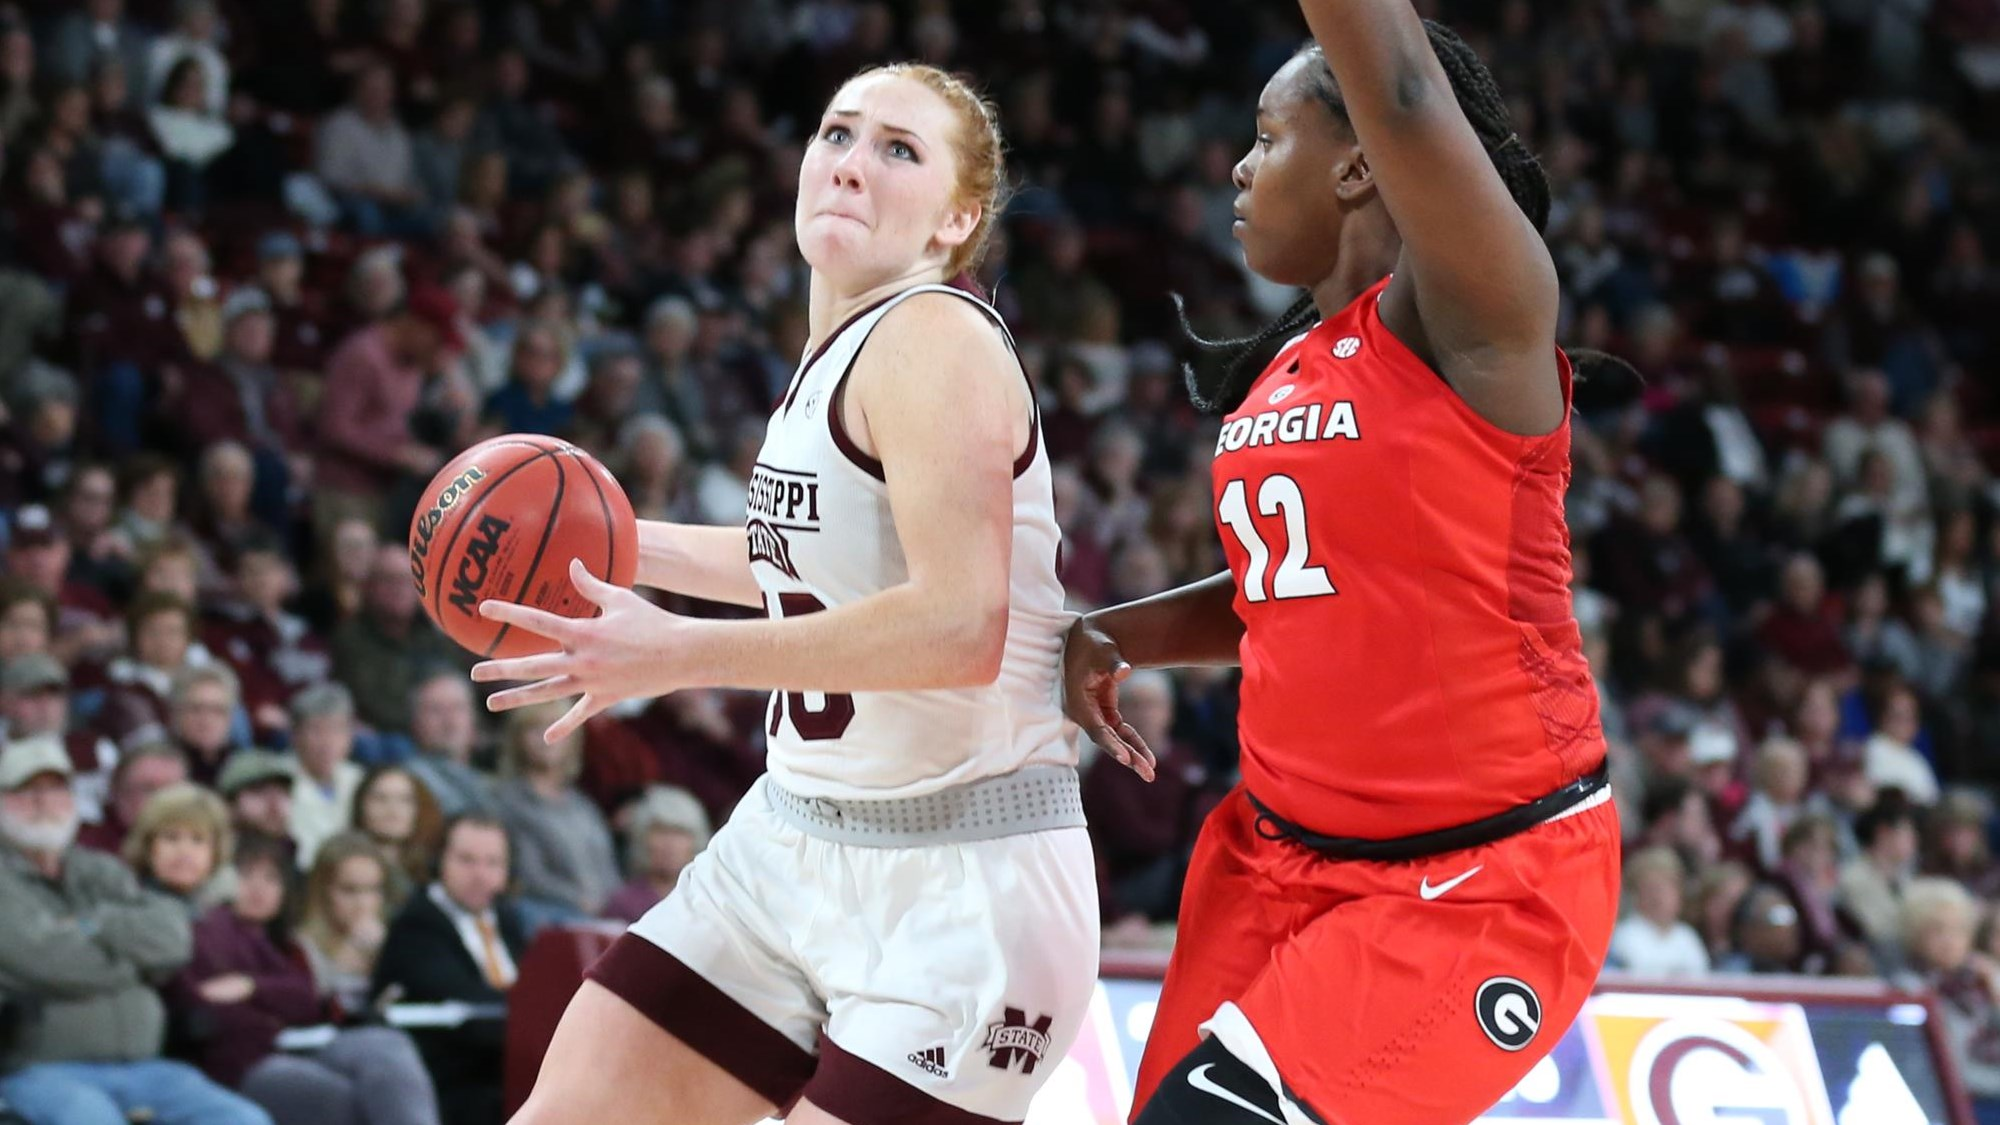 Mississippi State's Australian phenom Chloe Bibby breaks loose to give her team edge over Georgia